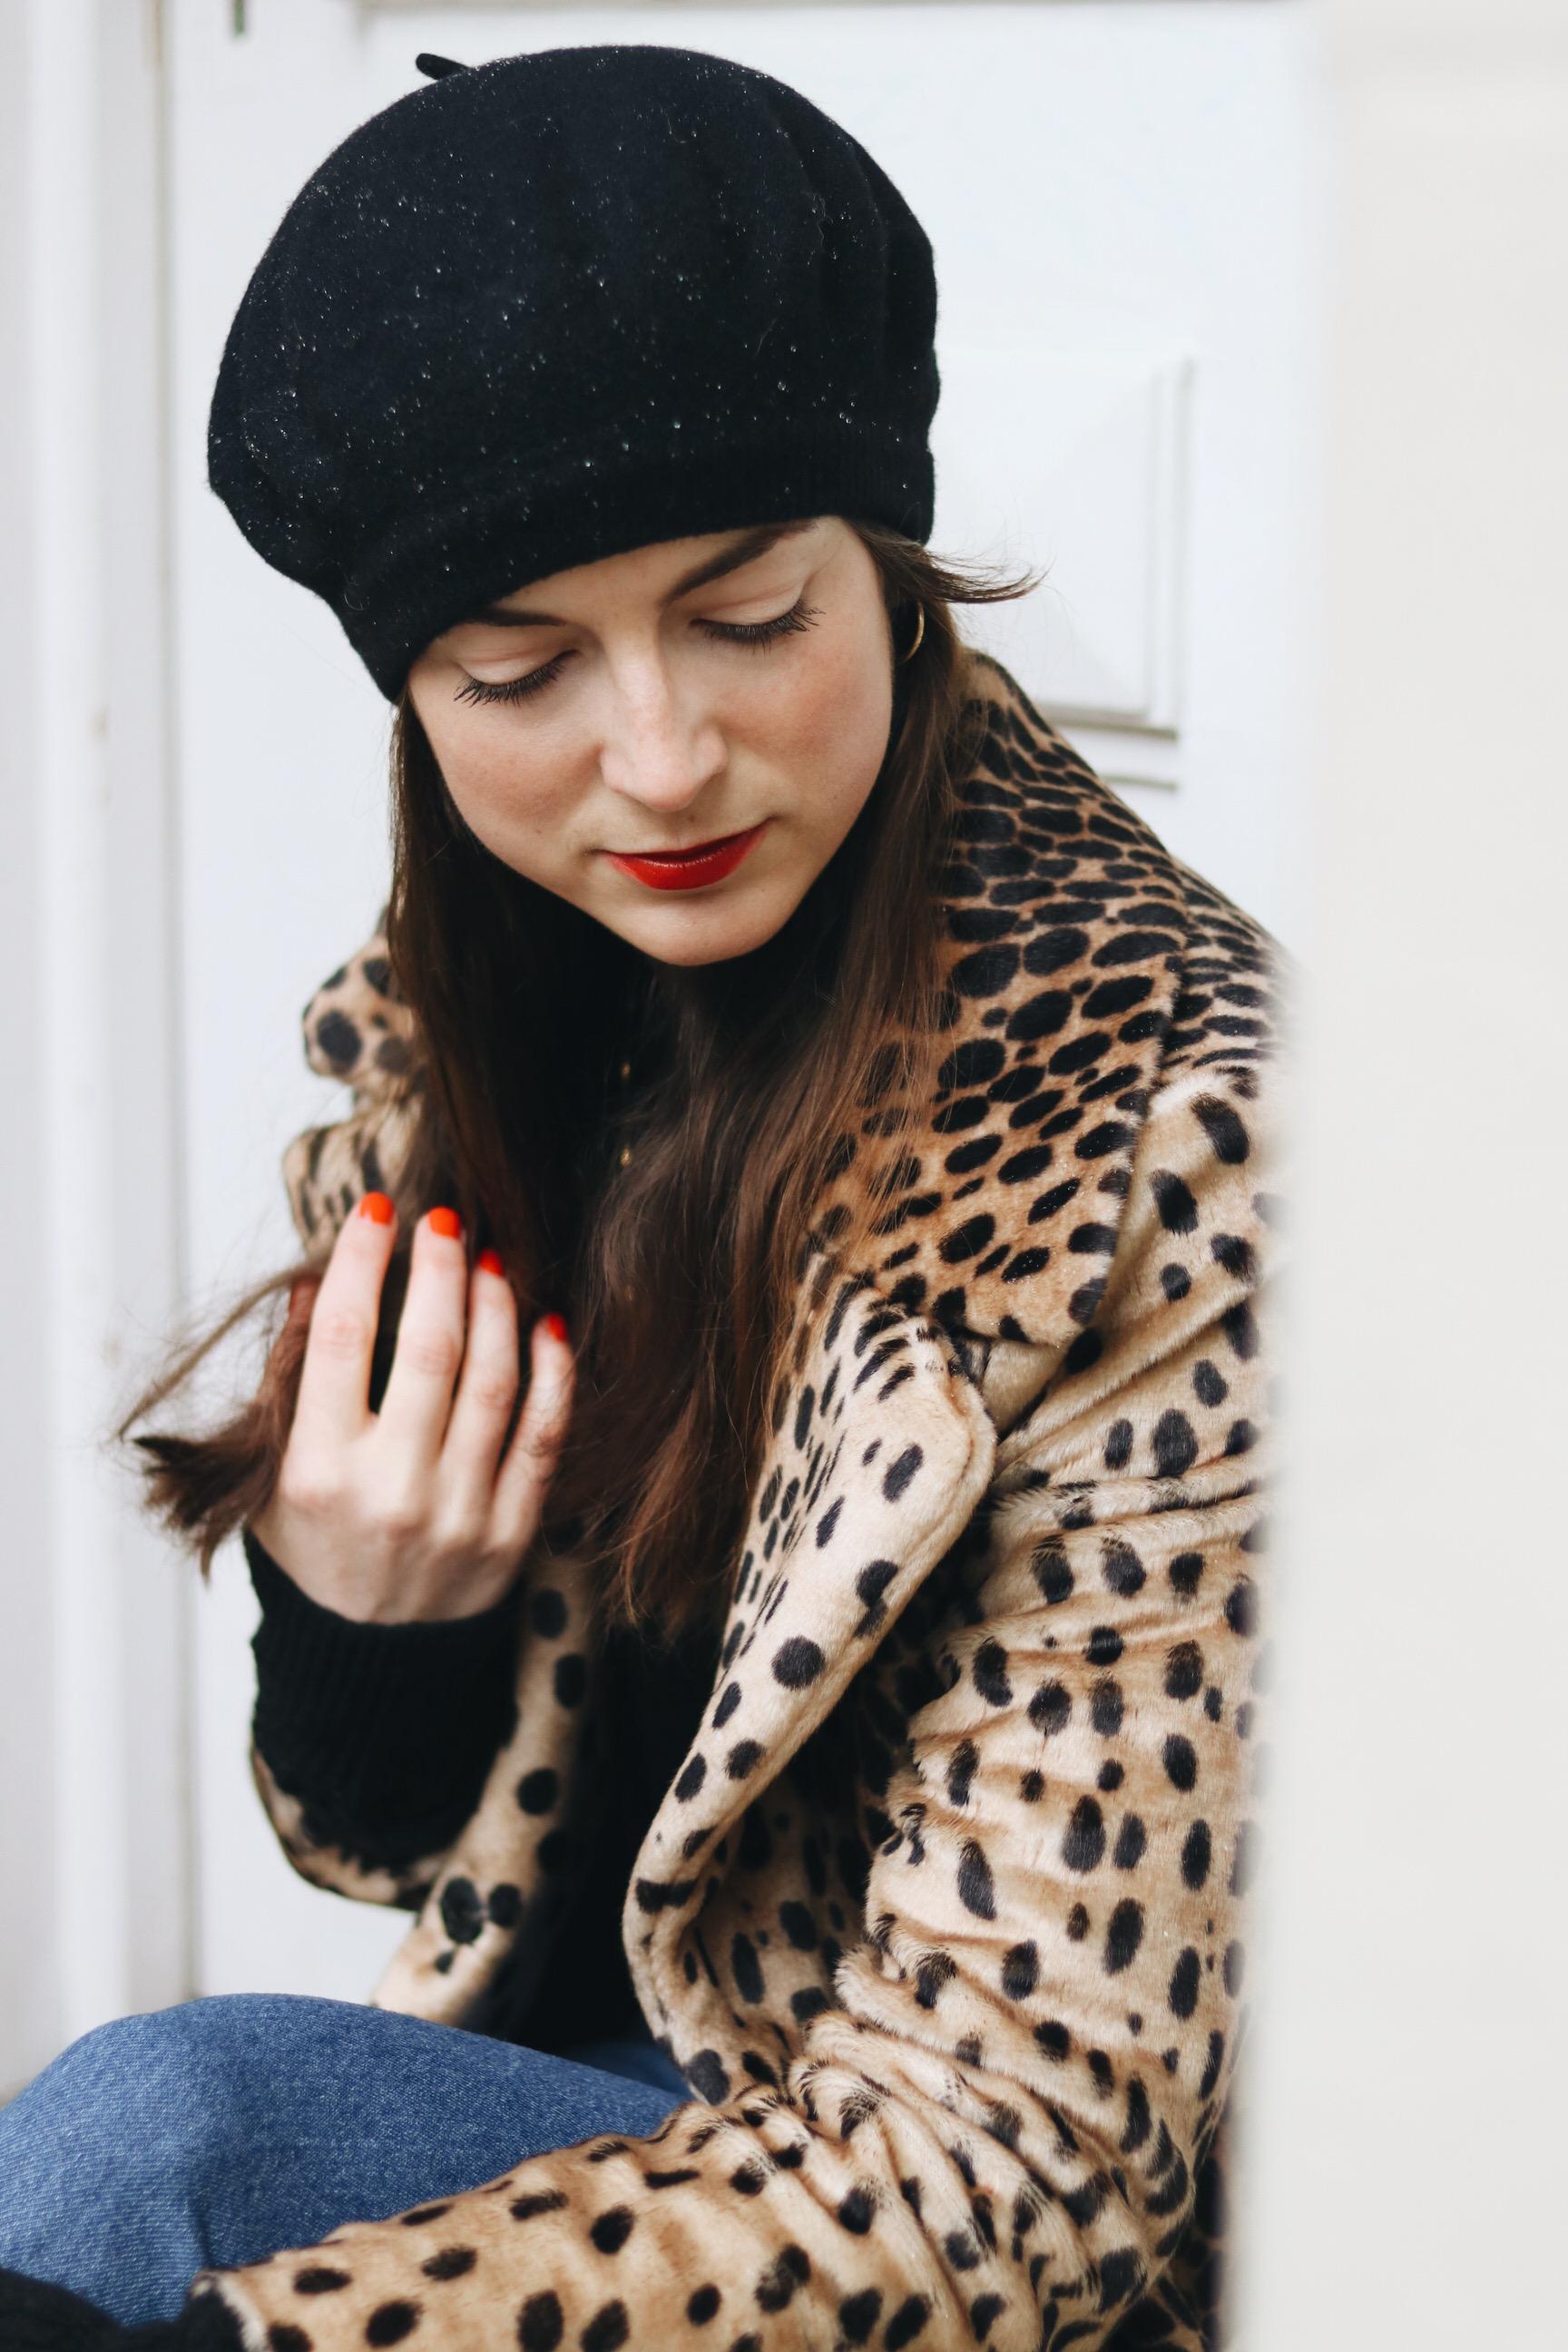 Leoprint Mantel Fashionblog BLog Outfit Streetstyle Look